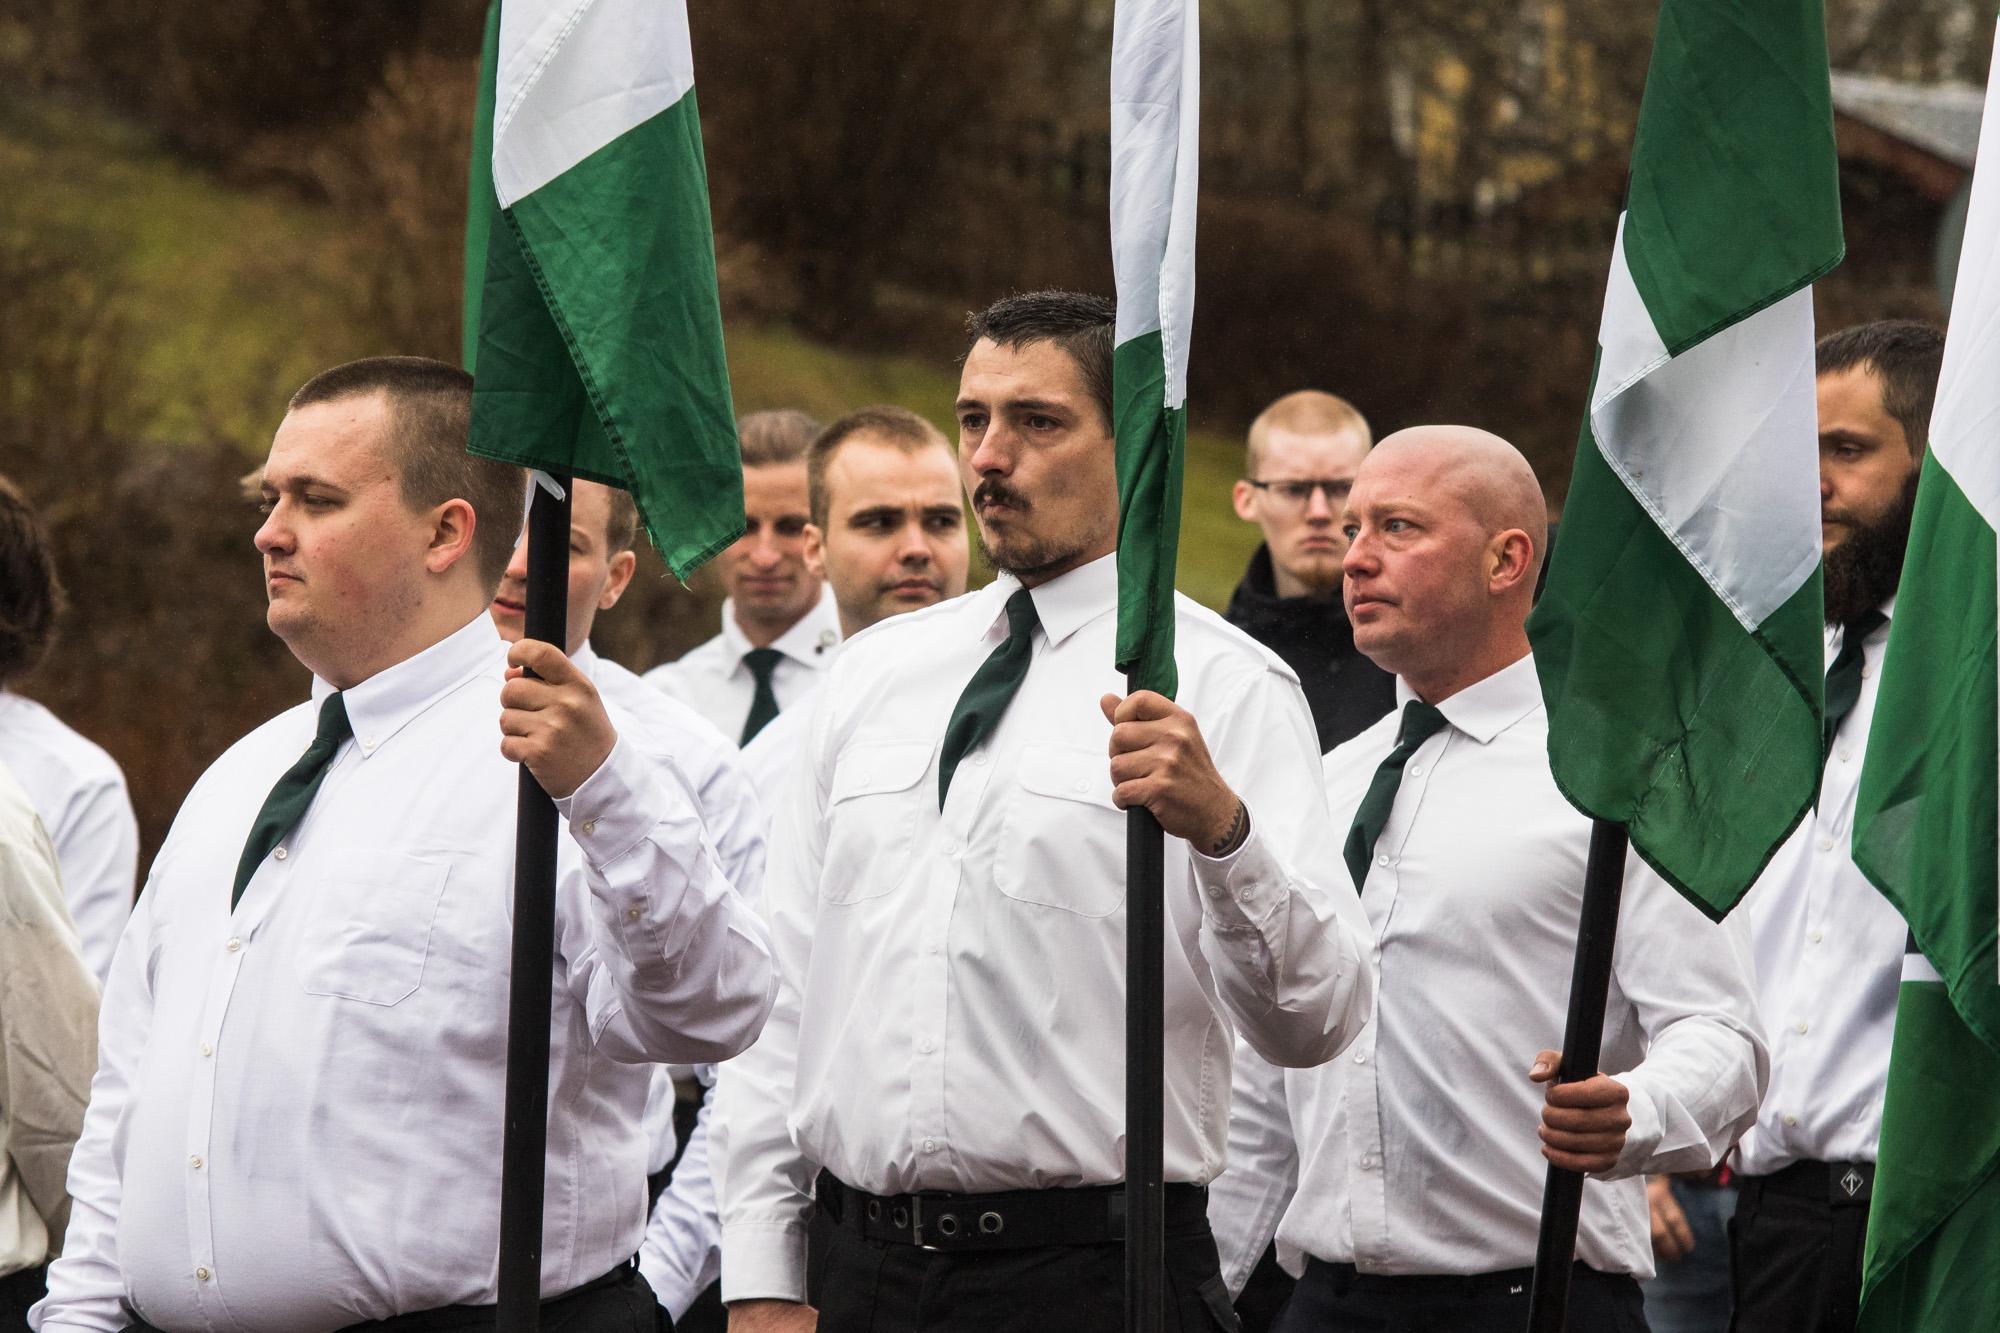 Jacob Vullum Andersen ses i midten under NMRs demonstration i den svenske by Ludvika 1. Maj 2018. Foto: Redox.